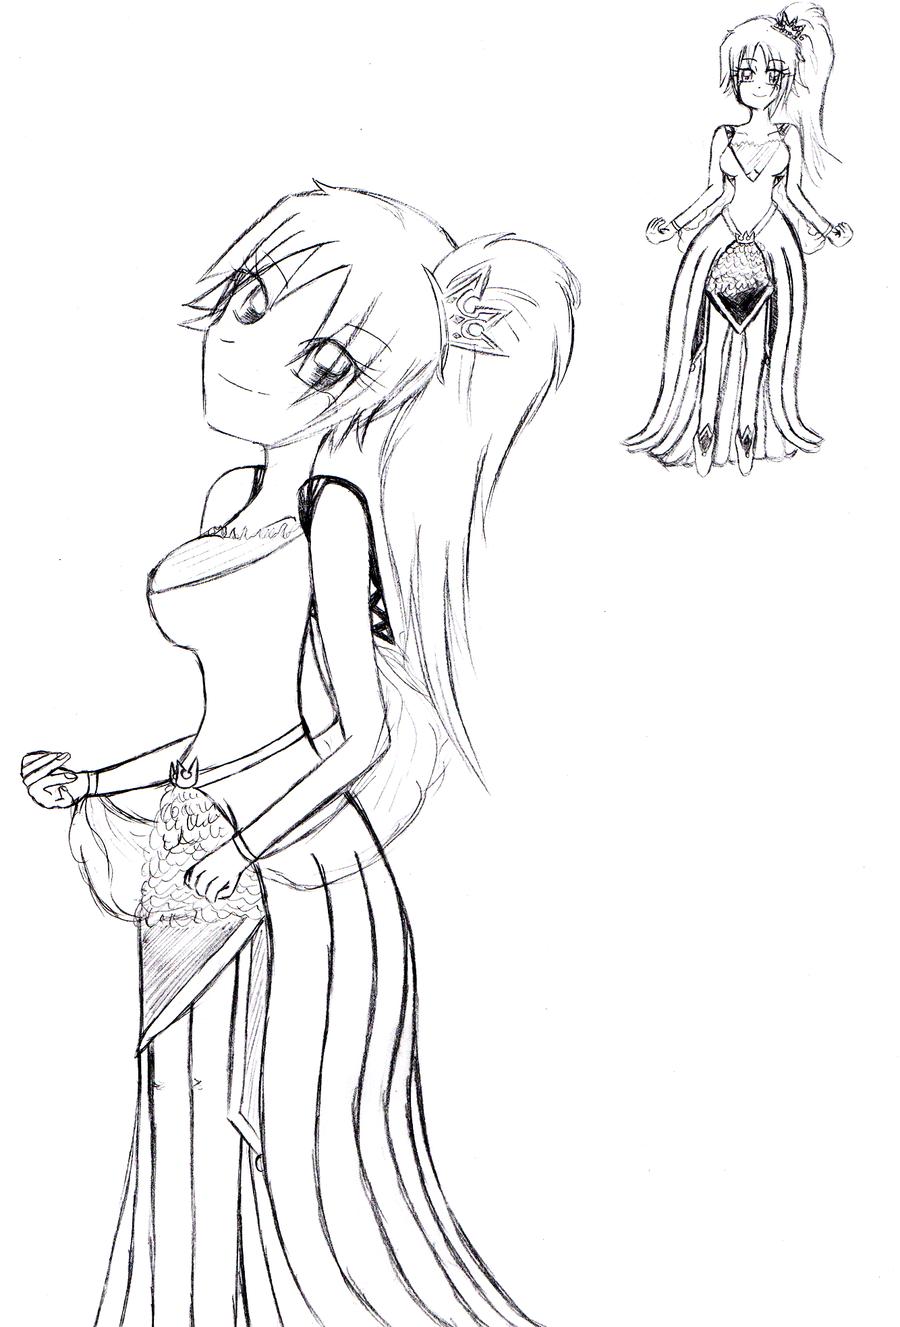 natsumi_hikari___sketch_by_twinnyblood-d